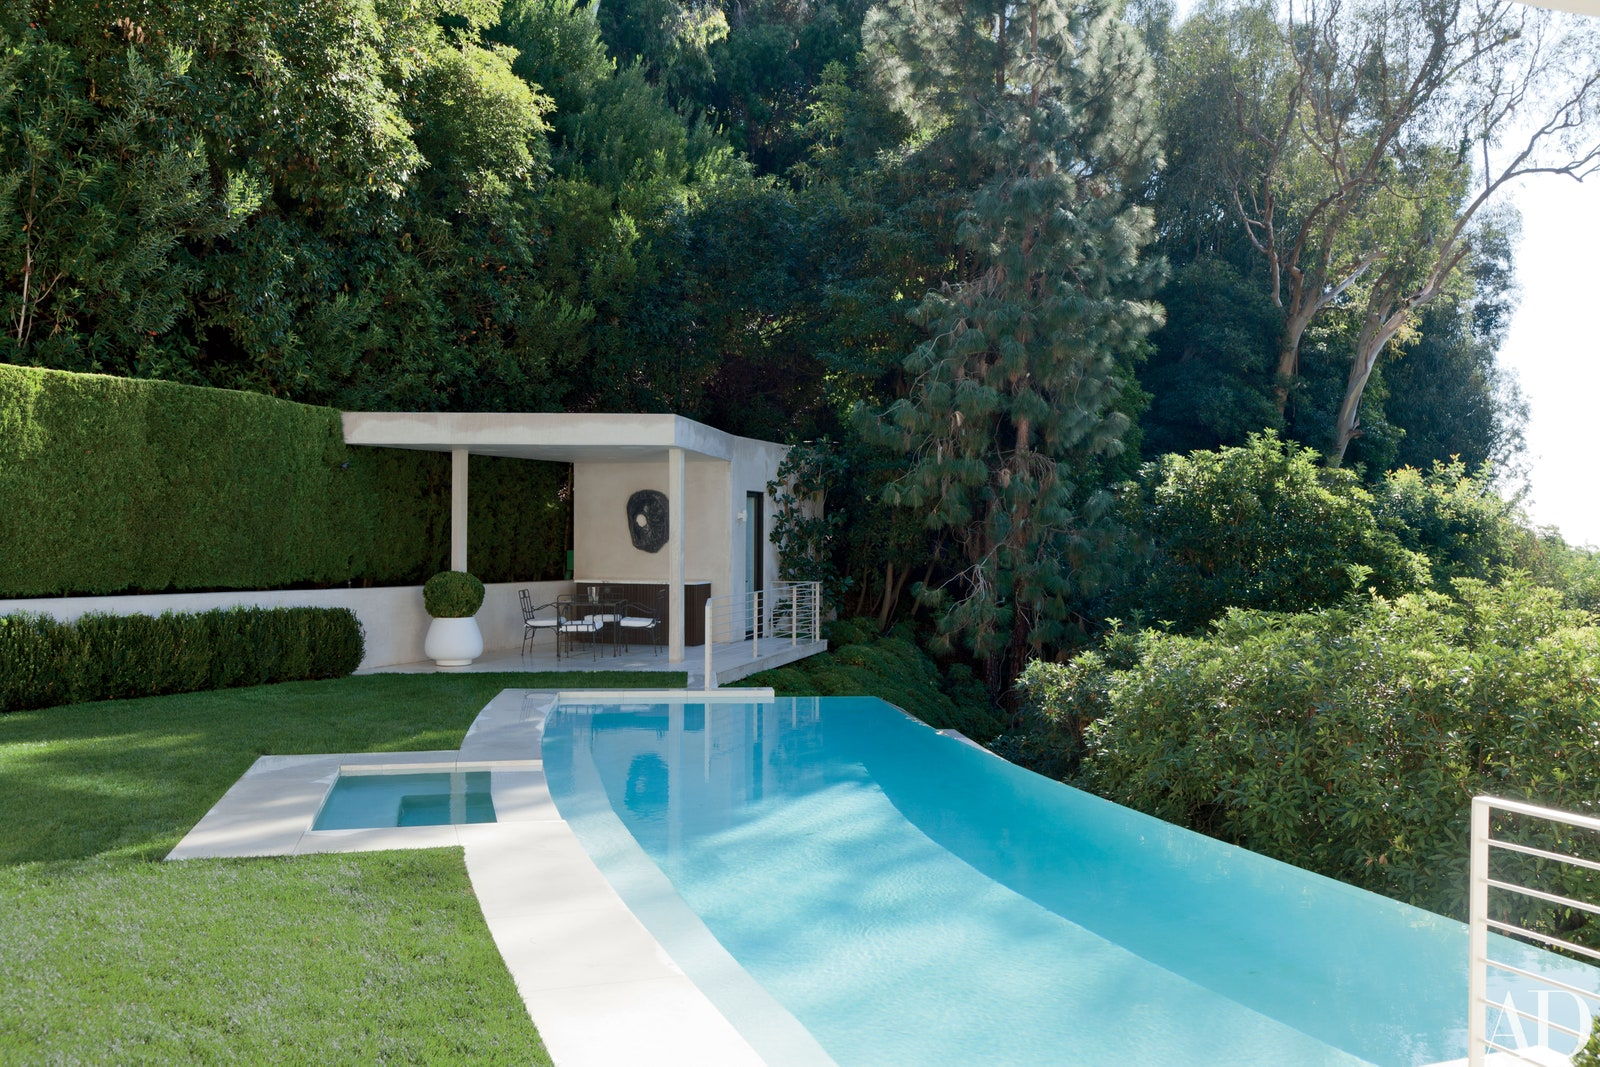 20 Wonderful Pool House Design Ideas   Modern Pool House Ideas   Foyr